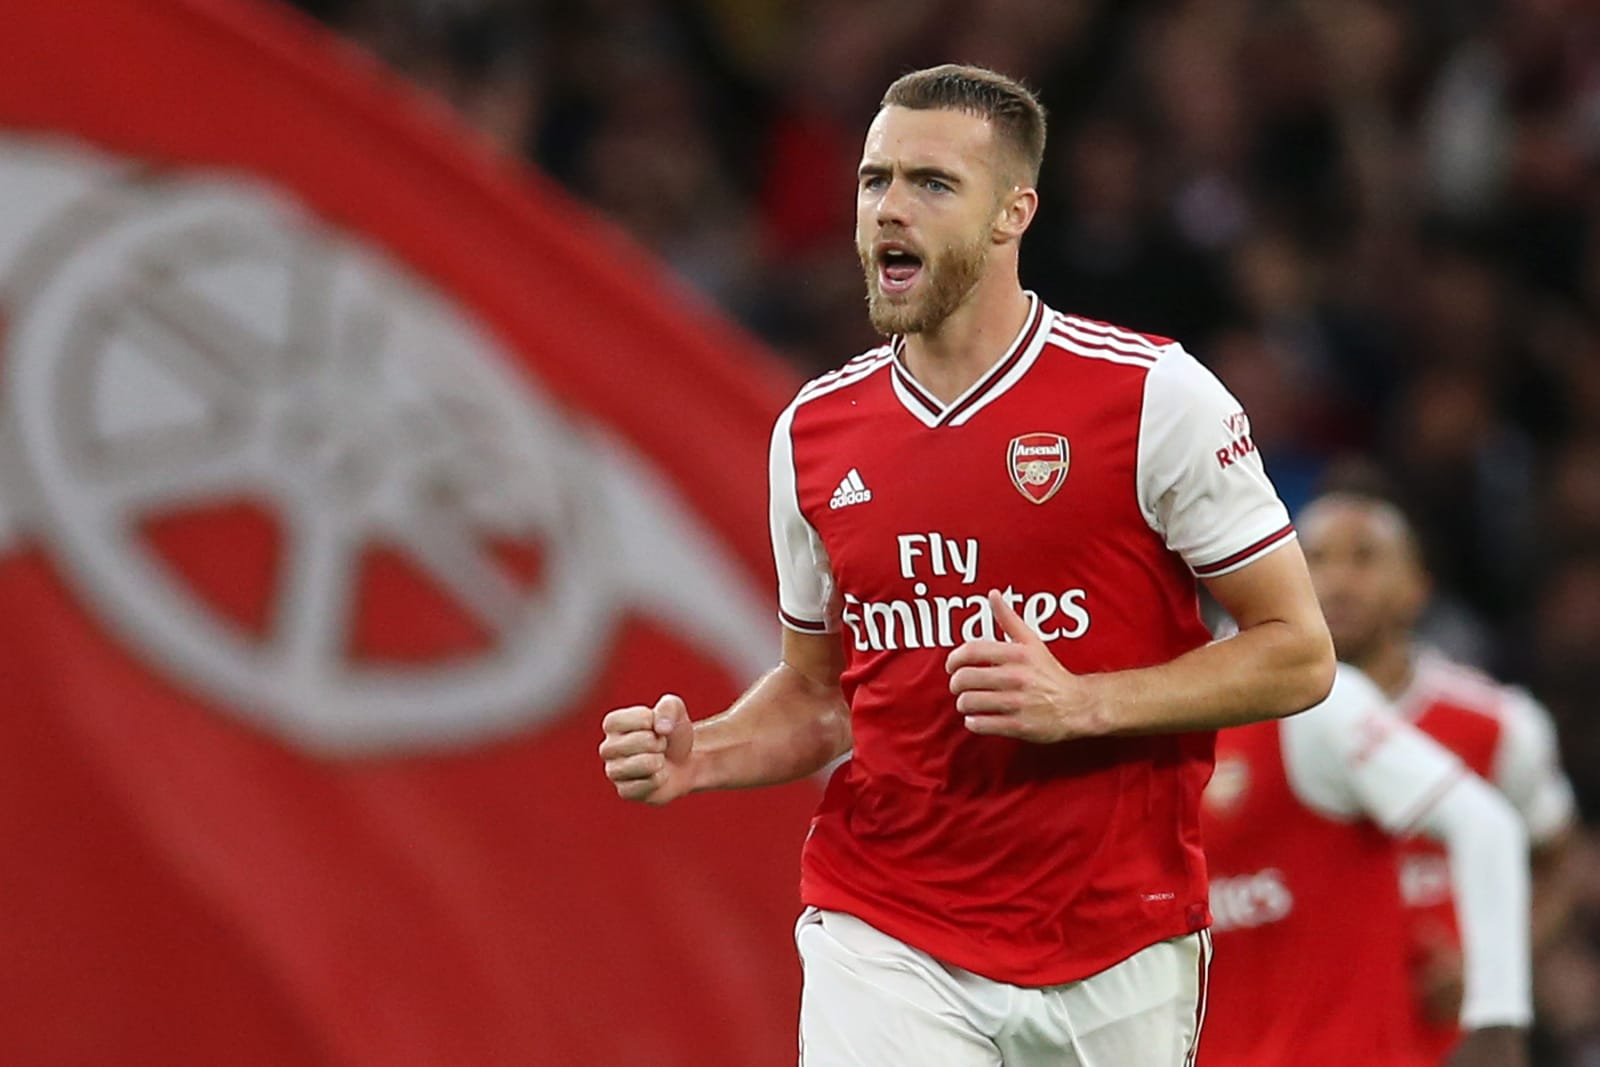 Arsenal, Calum Chambers